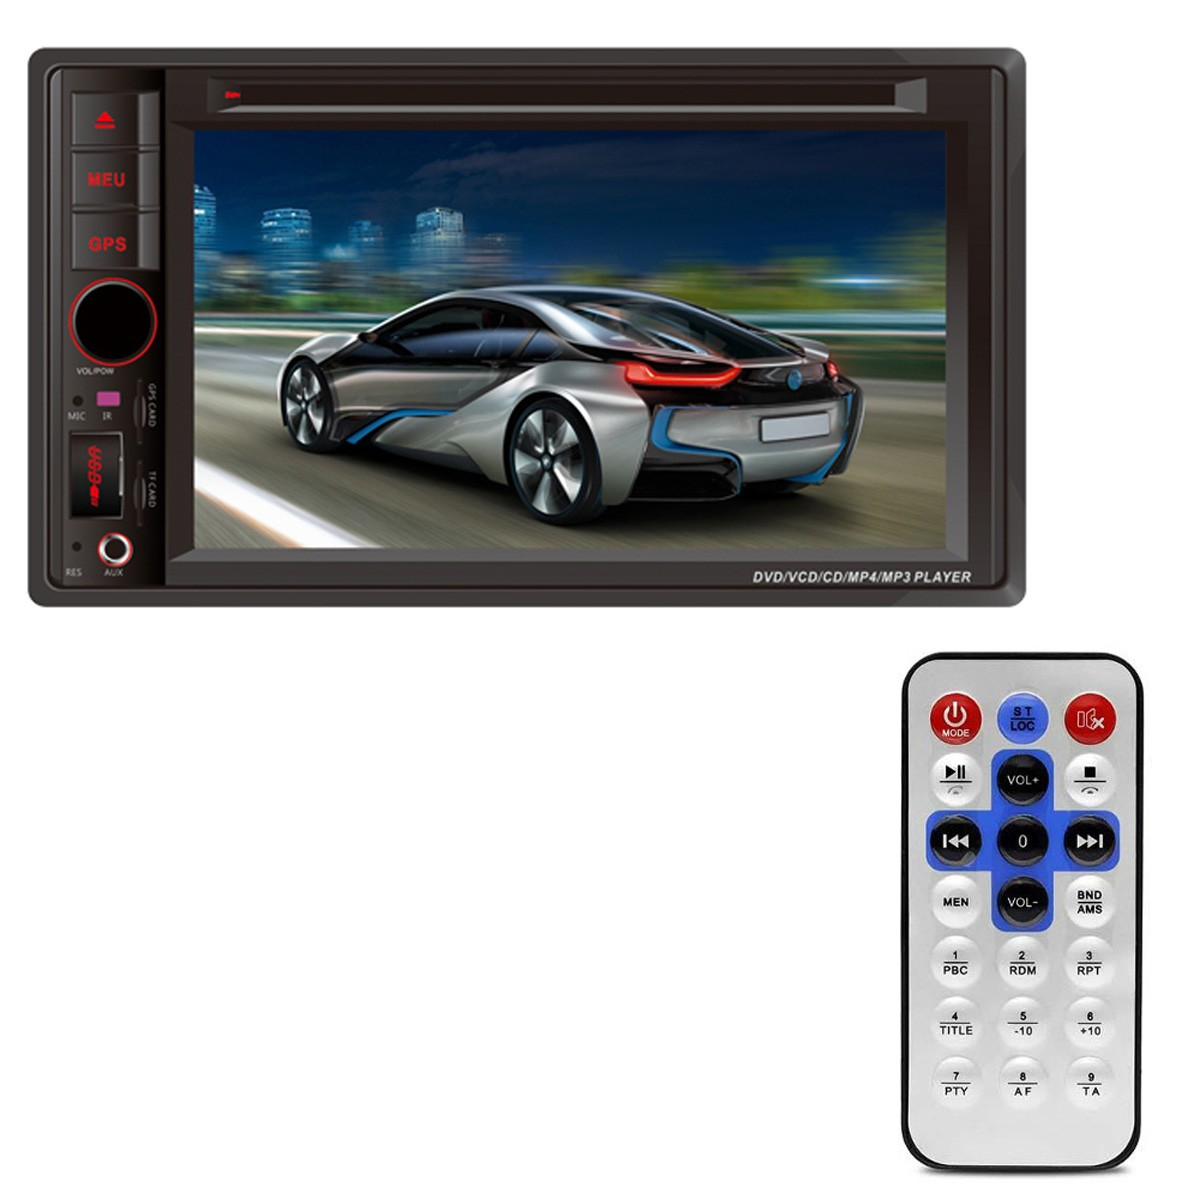 Central Multimídia FirstOption 2 Din 6.2 Polegadas DVD USB SD TV GPS AUX MP4 VCR Bluetooth